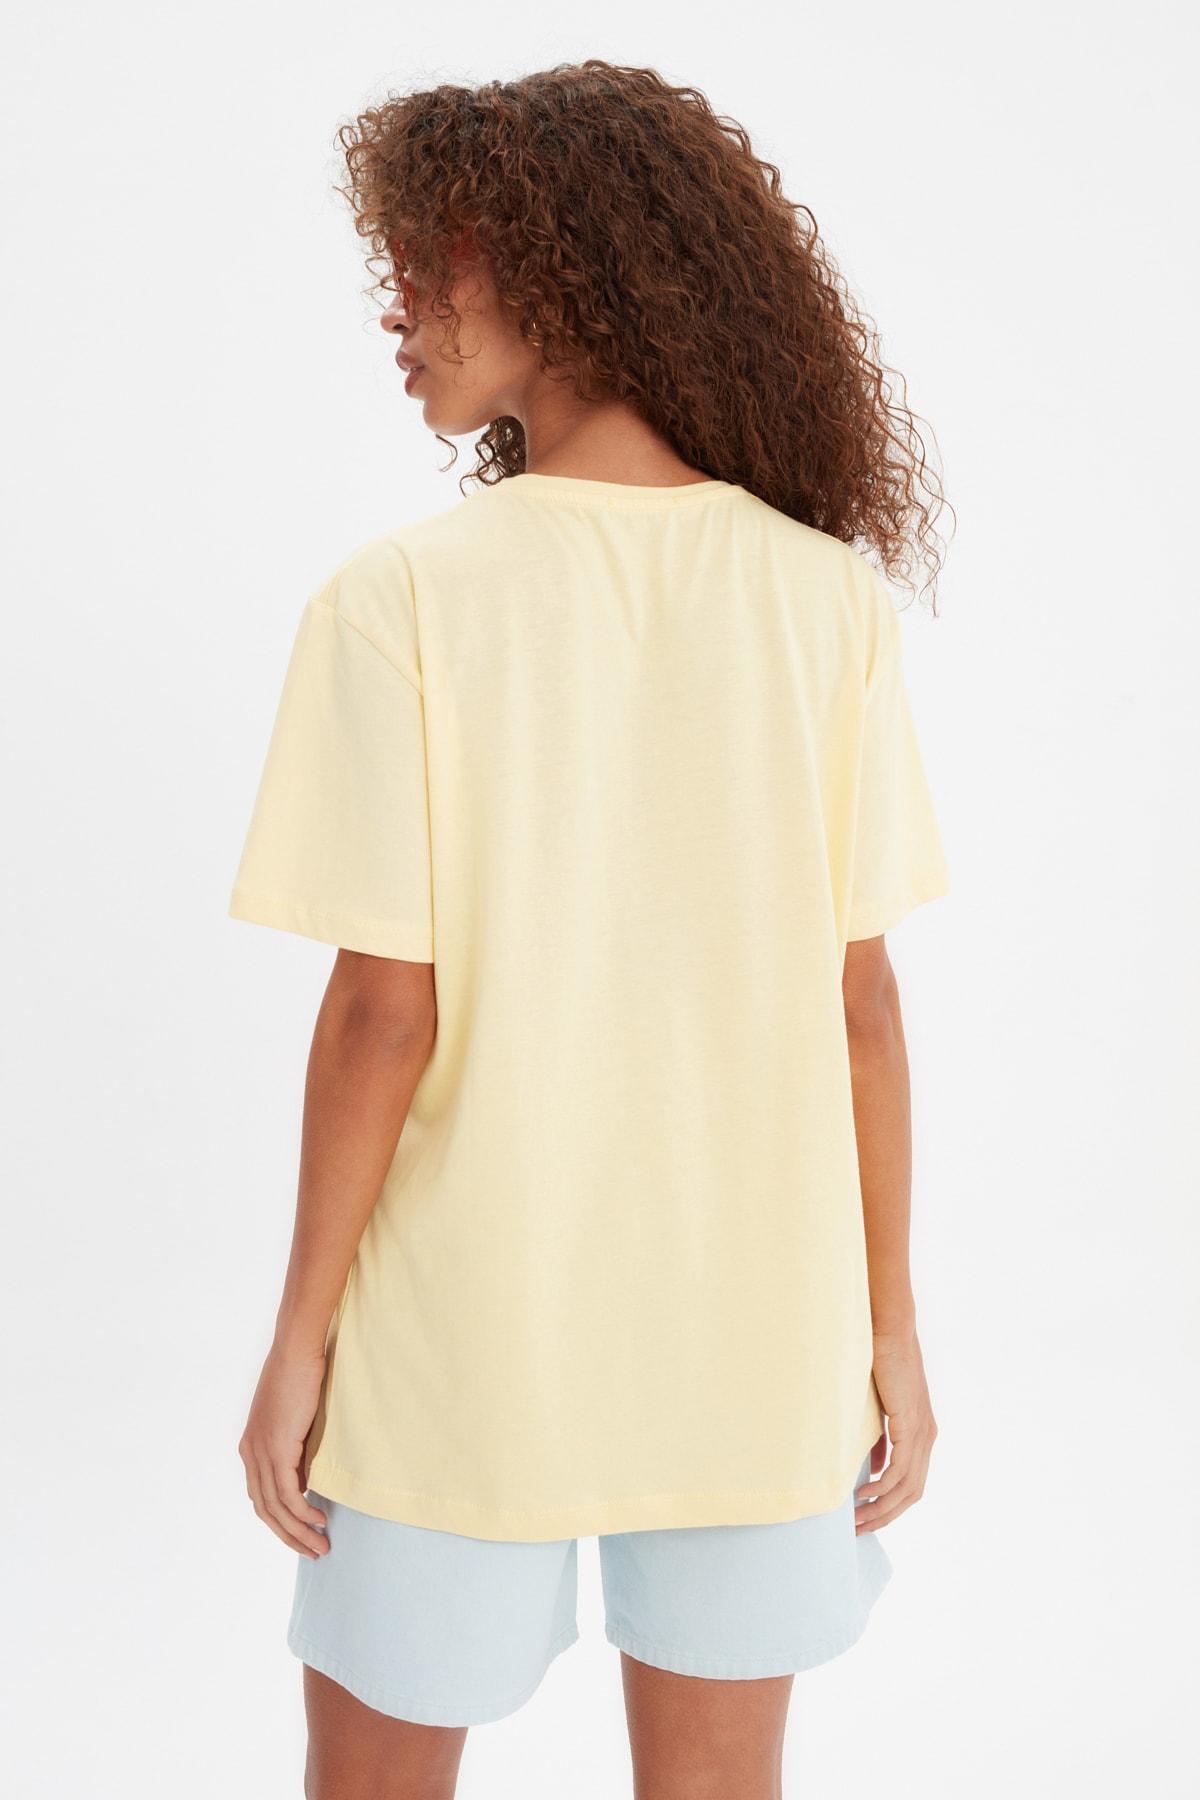 TRENDYOLMİLLA Sarı Baskılı Boyfriend Örme T-Shirt TWOSS21TS3398